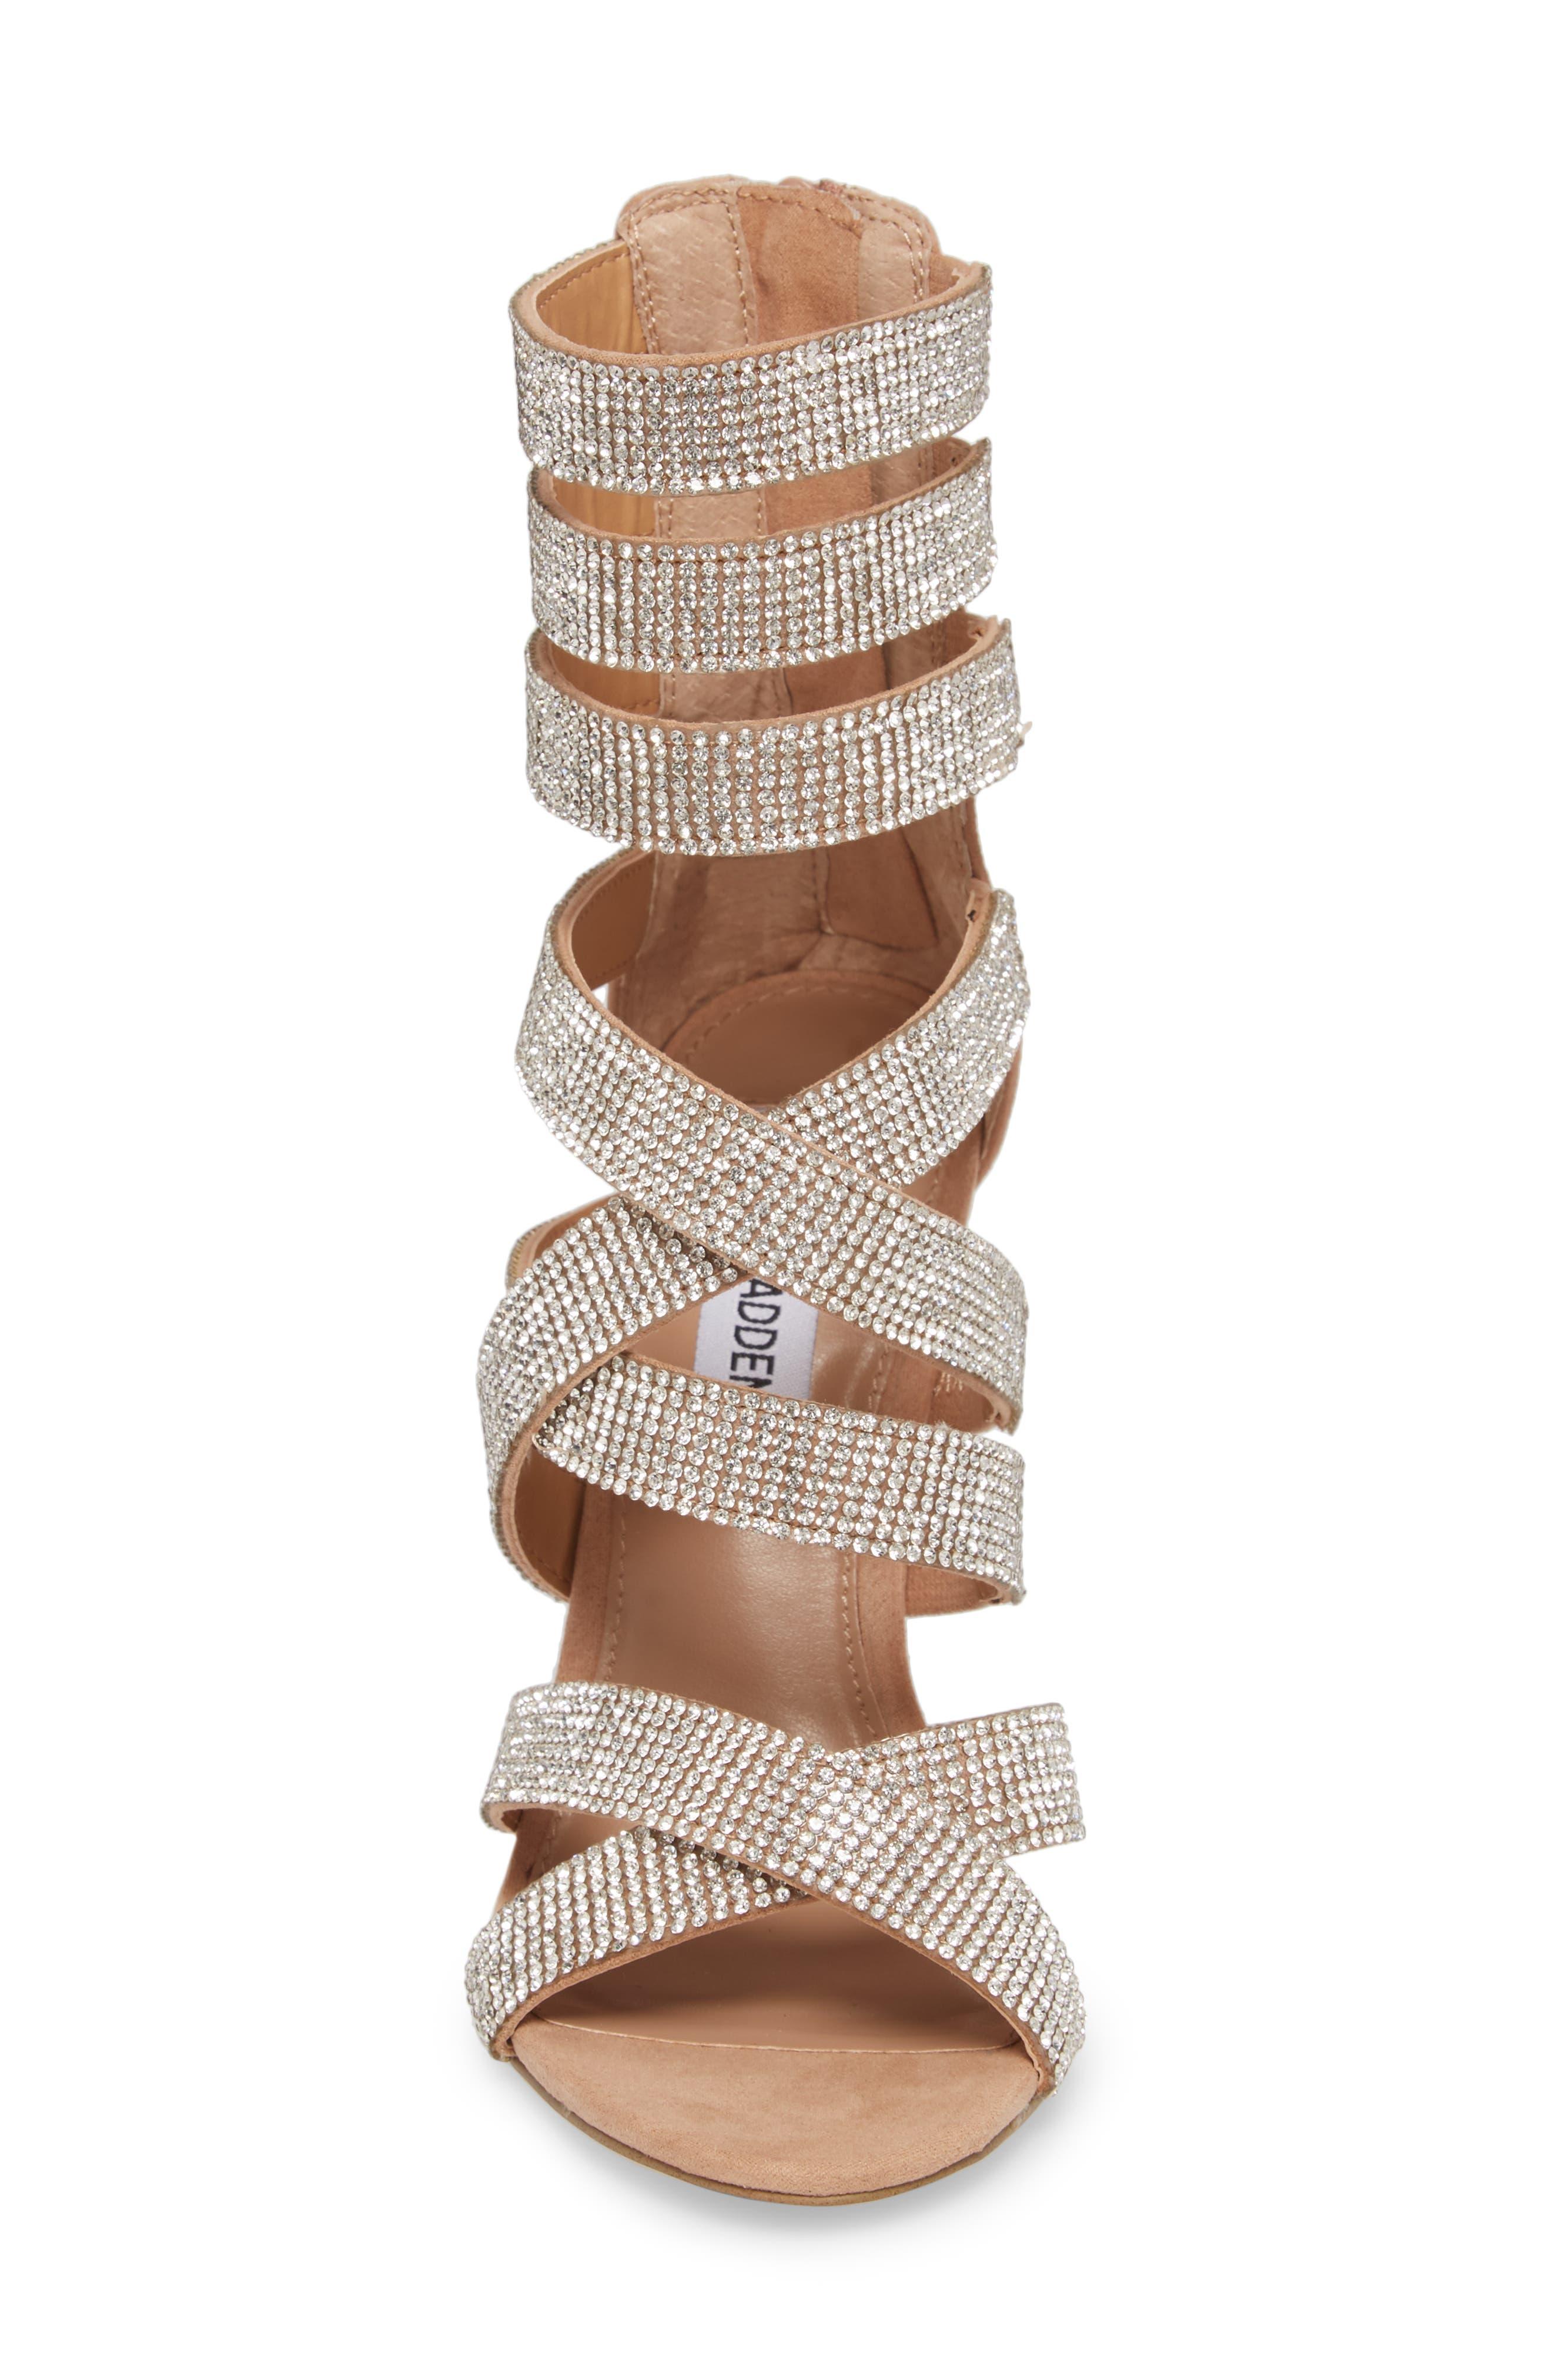 Malika Crystal Embellished Sandal,                             Alternate thumbnail 5, color,                             Rhinestone